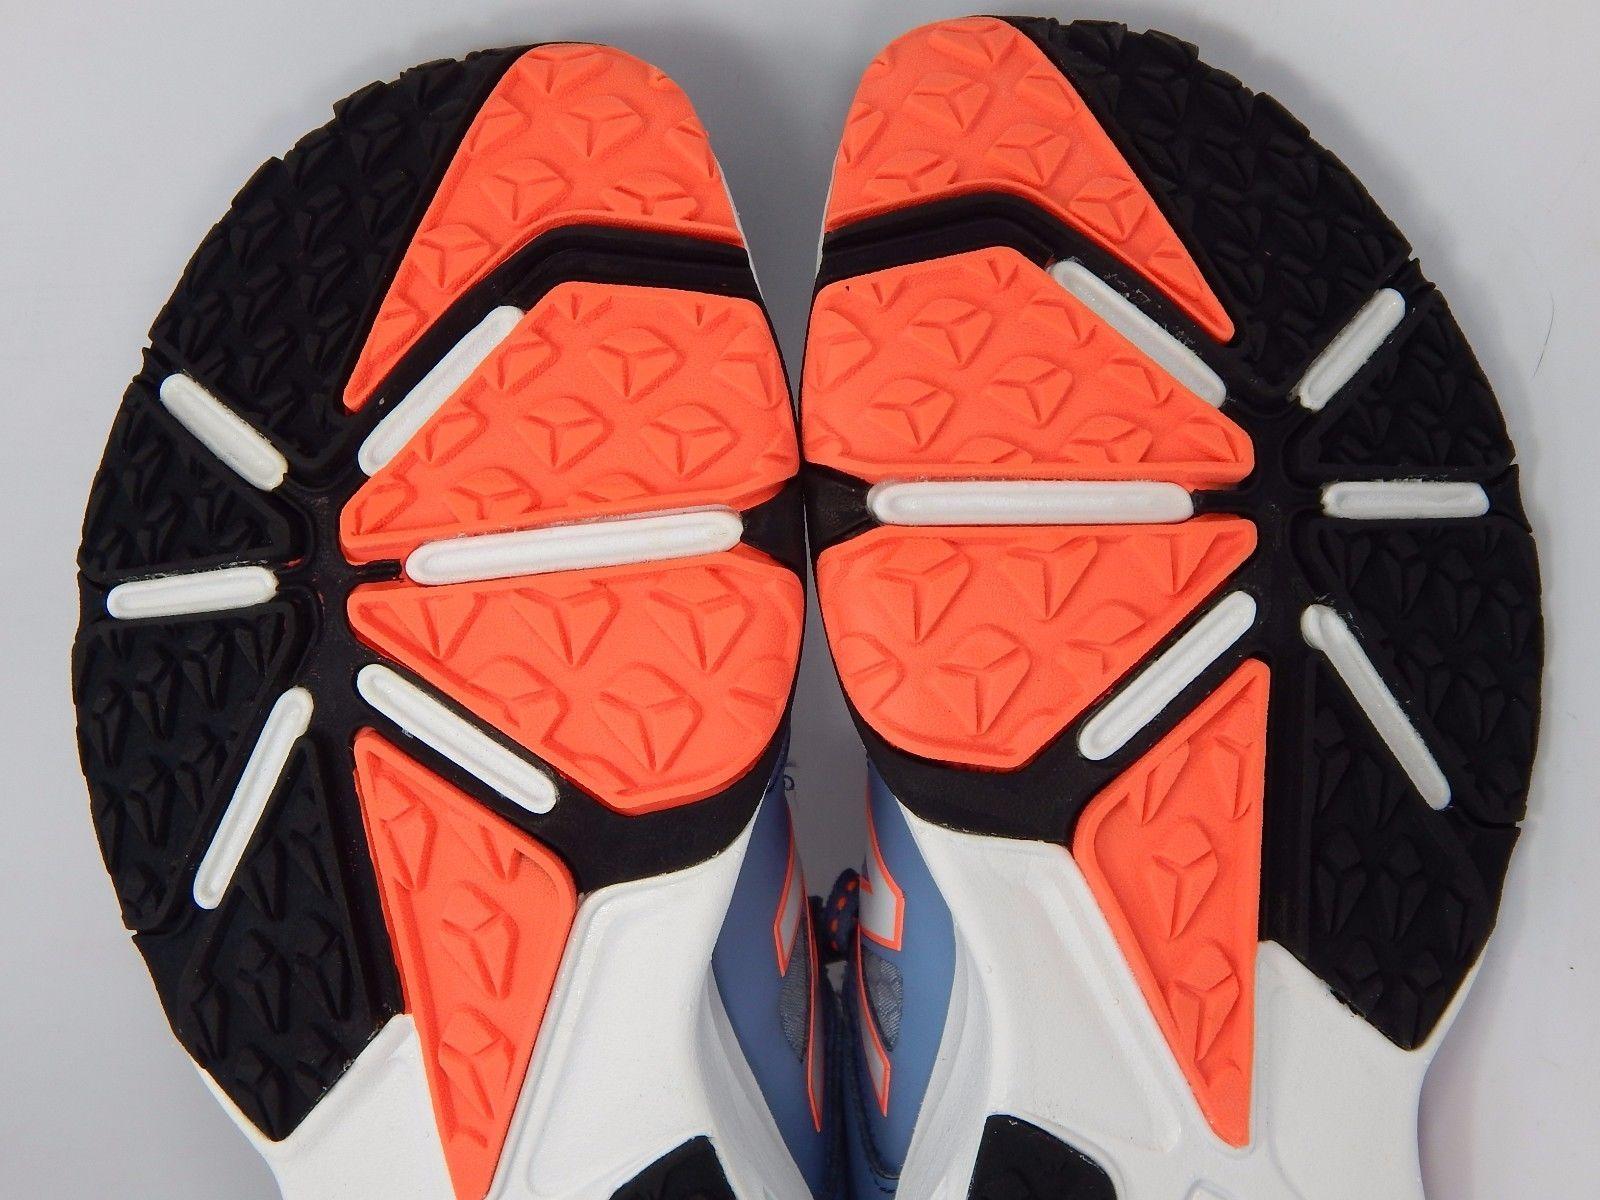 New Balance Vazee Agility Womens Cross Training Shoes Sz 8.5 M (B) EU 40 WXAGLID